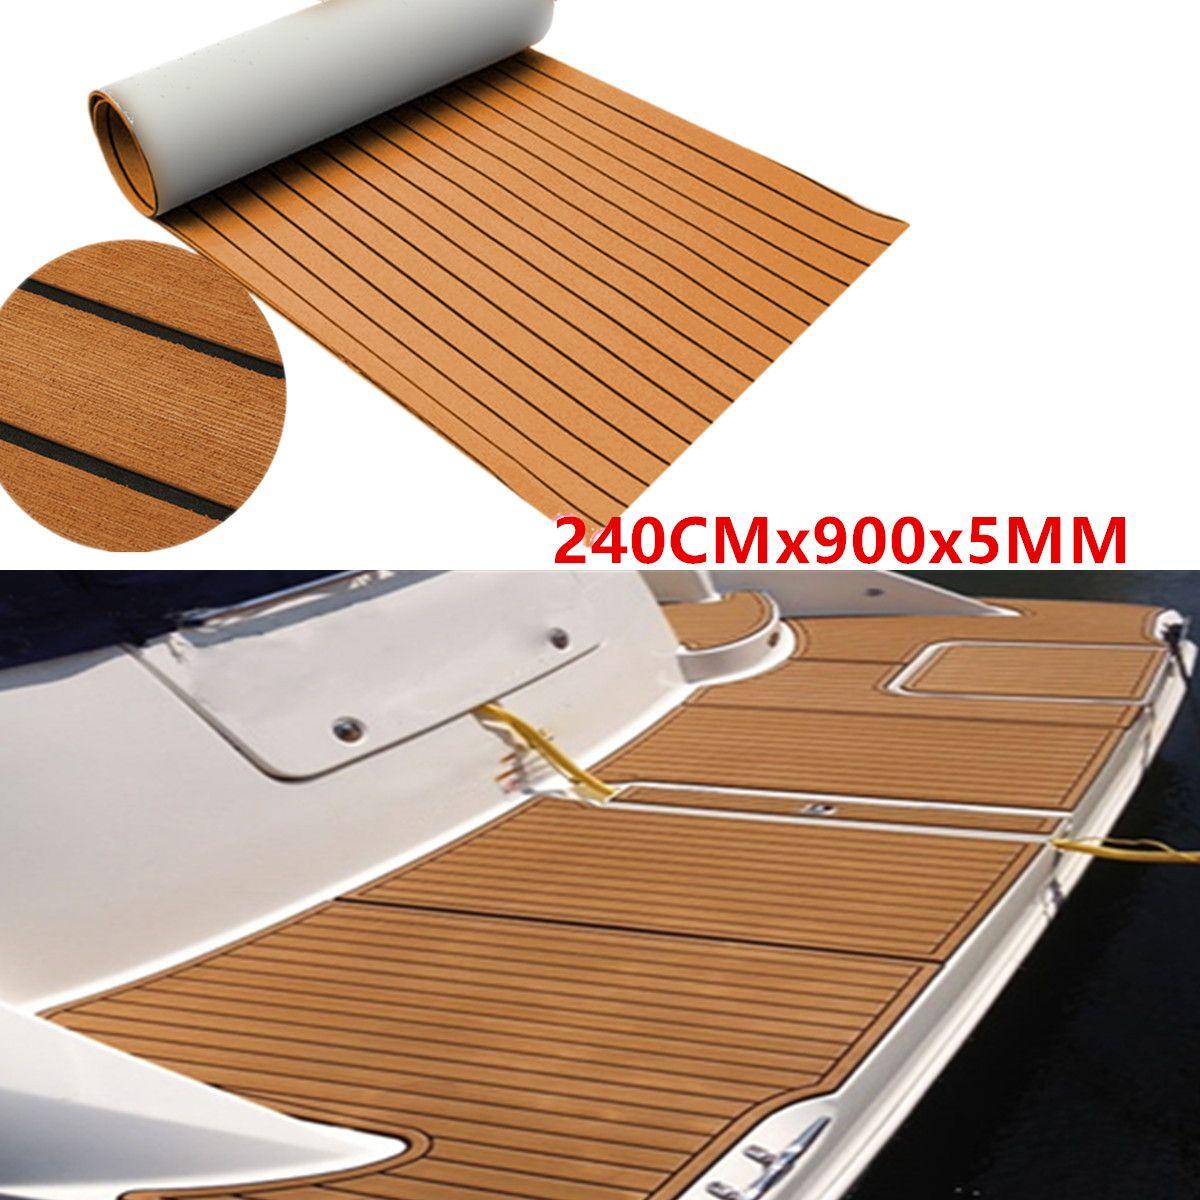 2400x900mm Thicken EVA Foam Boat Yacht RV Caravan Marine Flooring Faux Teak Boat Decking Non skid Sheet Floor Decoration Mat-in Marine Hardware from Automobiles & Motorcycles    1